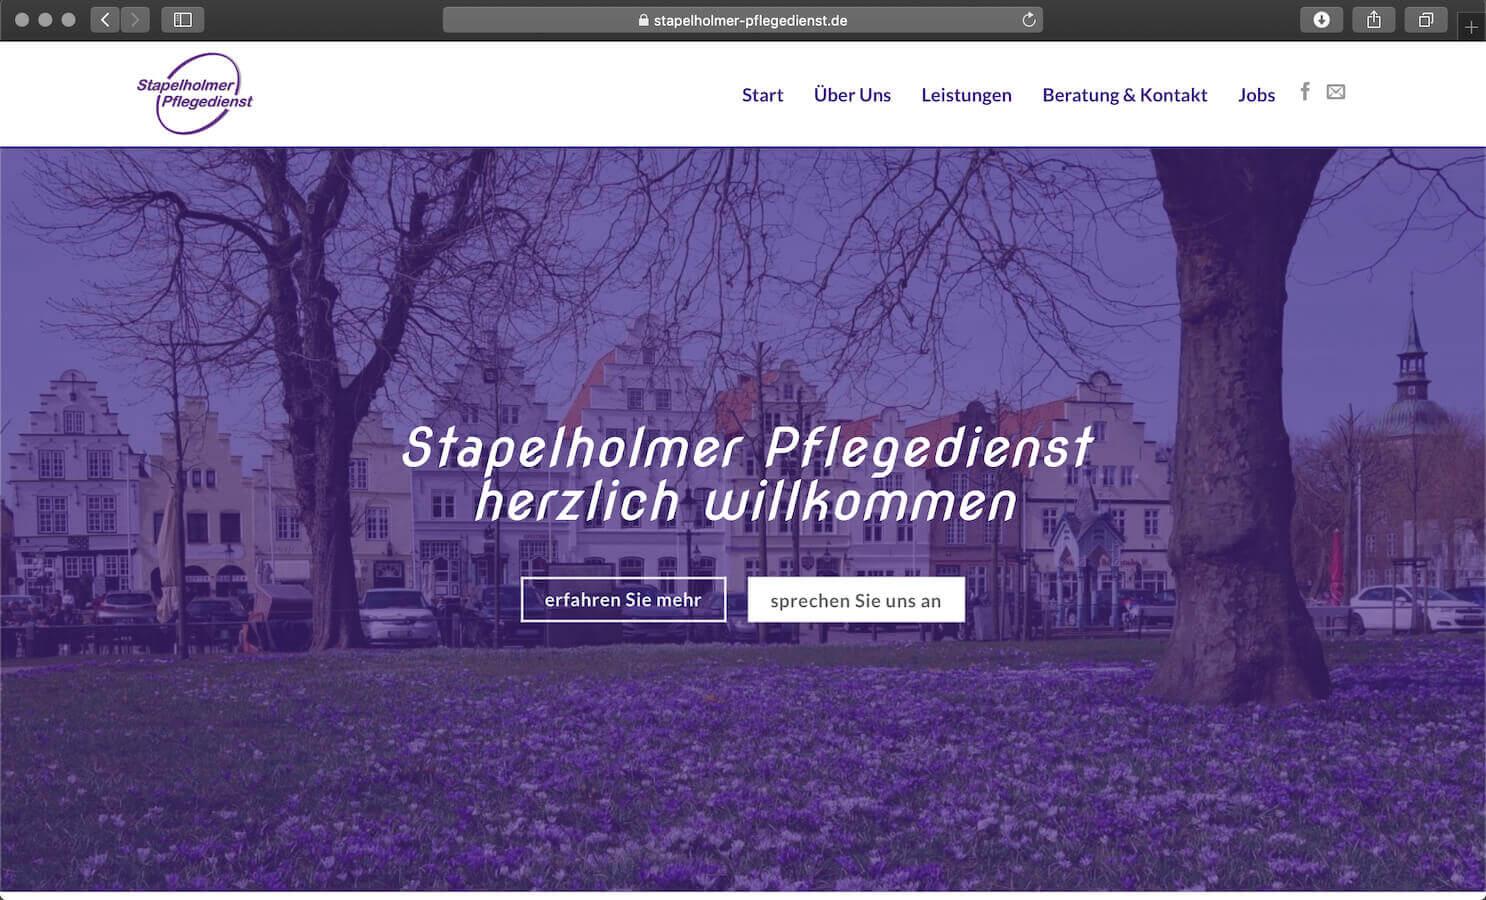 STAPELHOLMER PFLEGEDIENST . CM1K